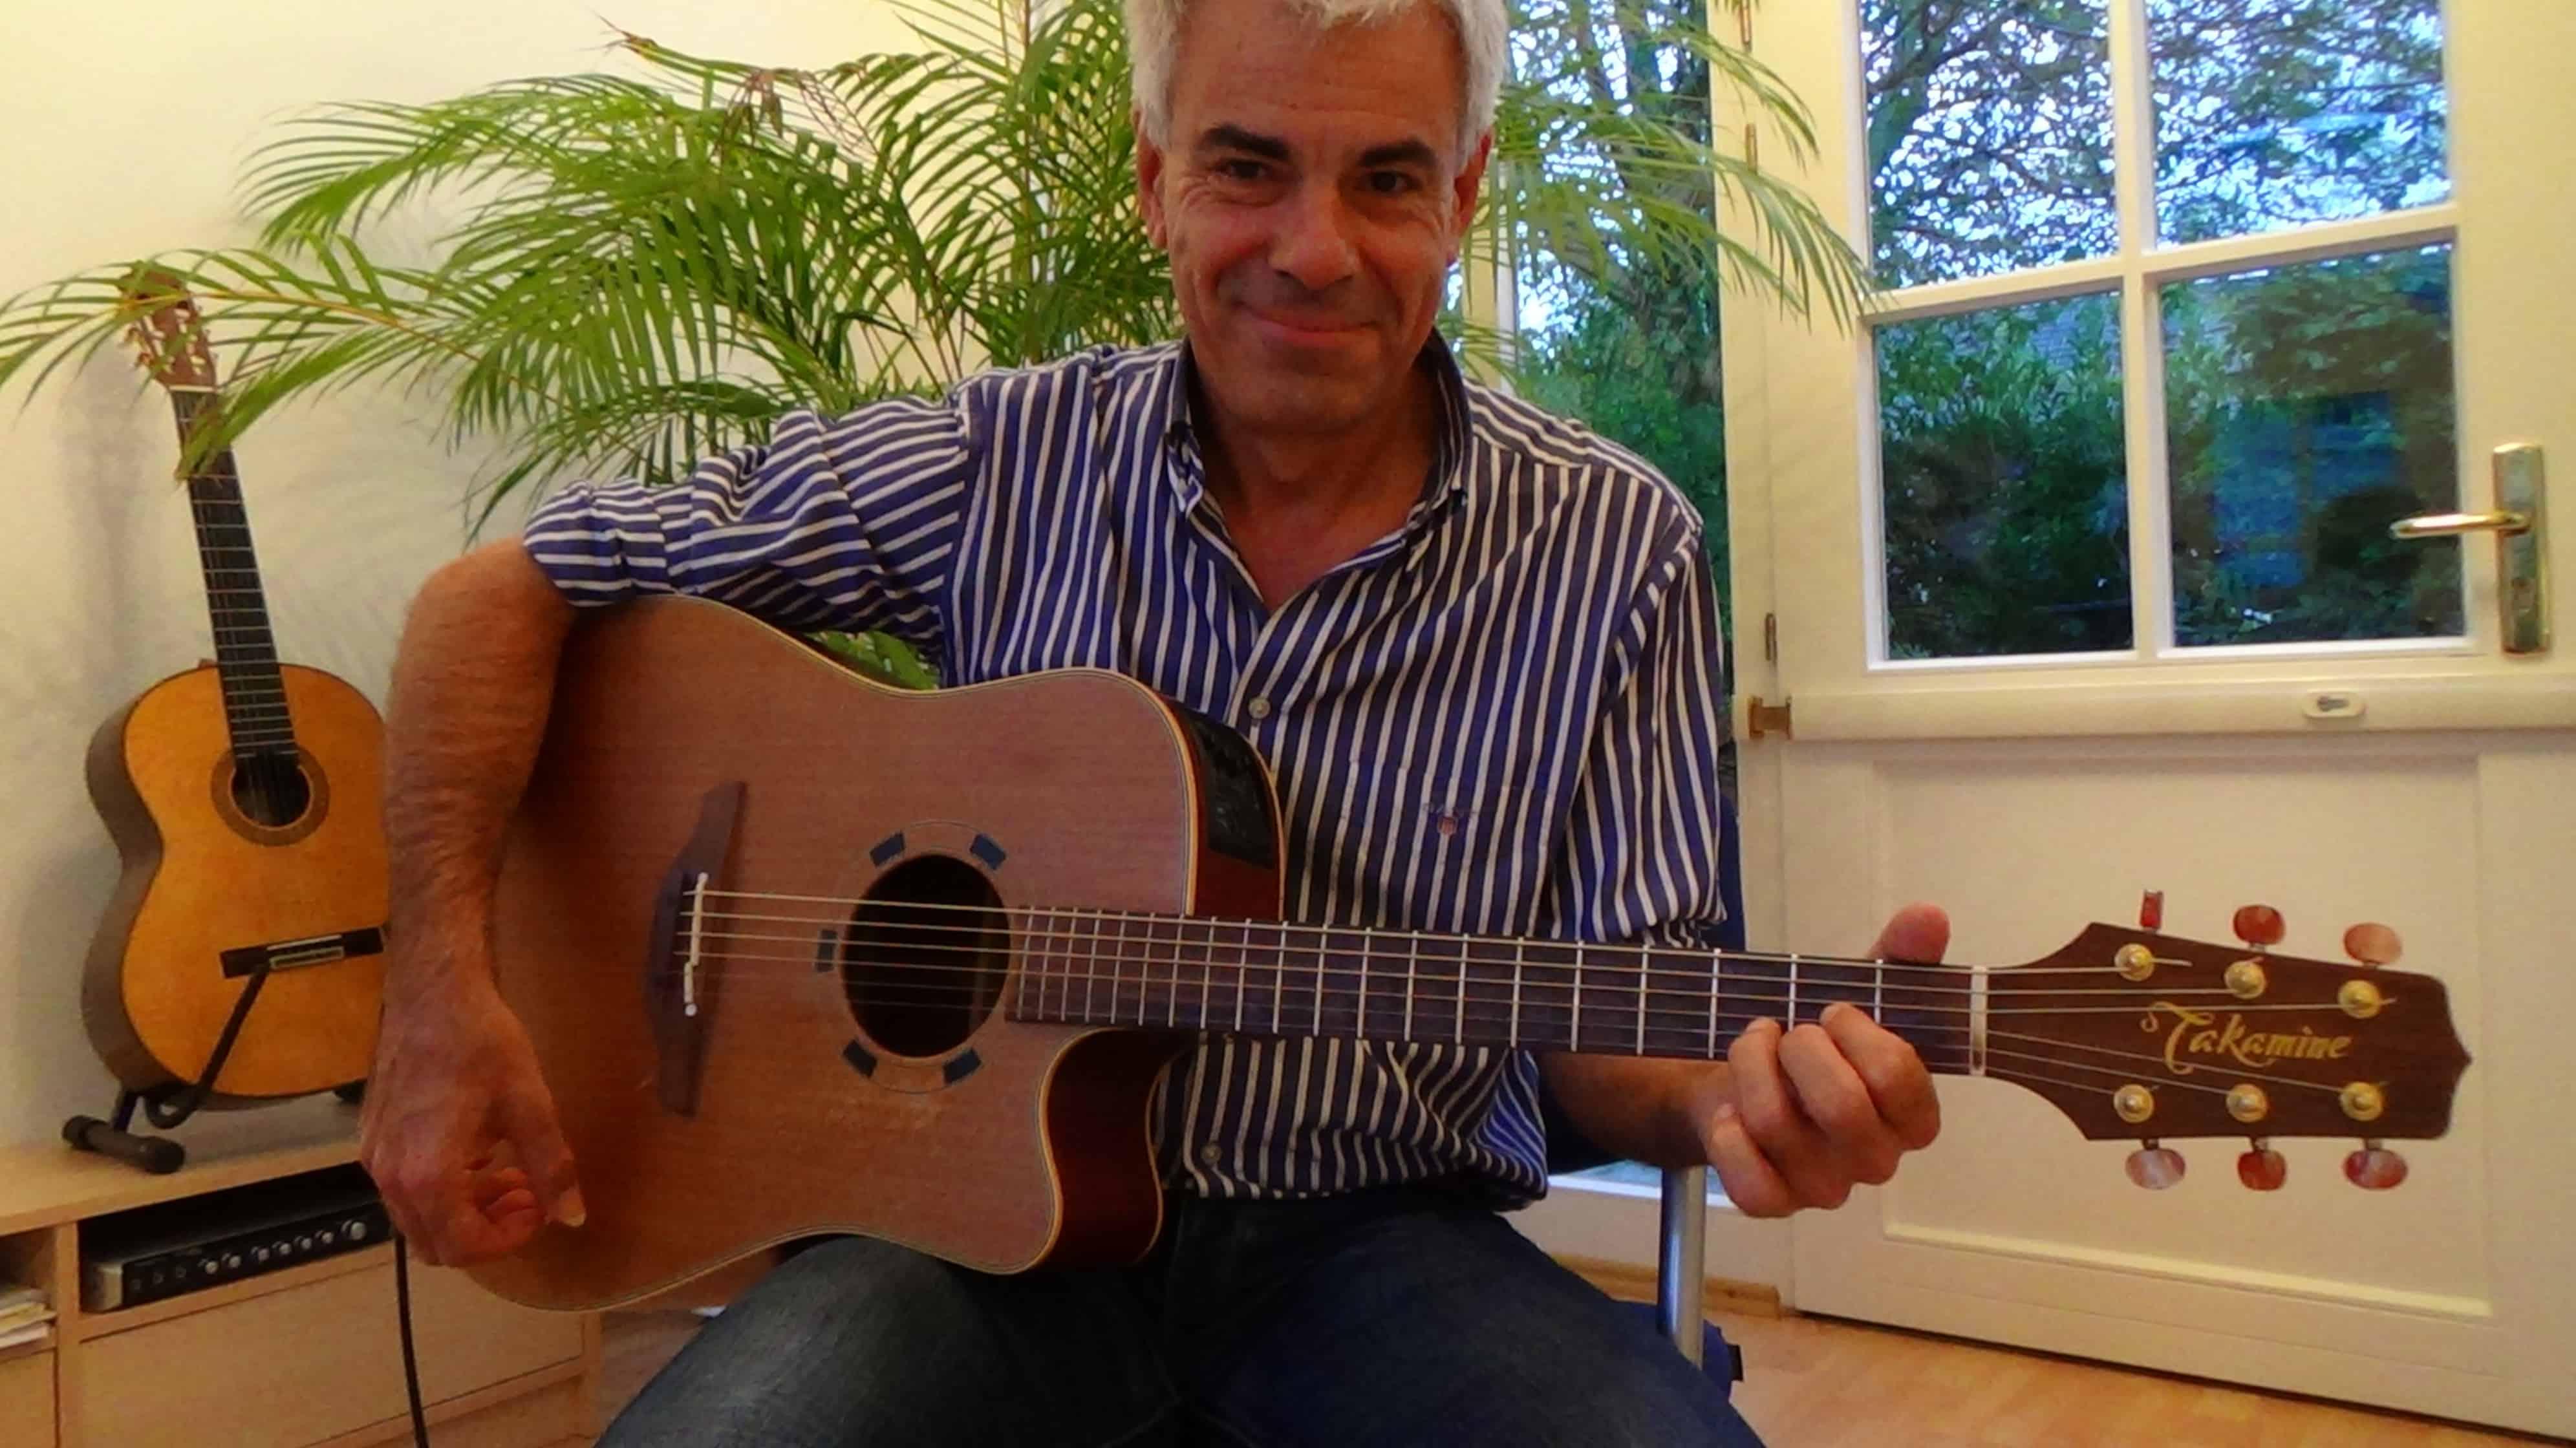 Andreas Hövelmann Konzertgitarre akustische Gitarre klassische Gitarre